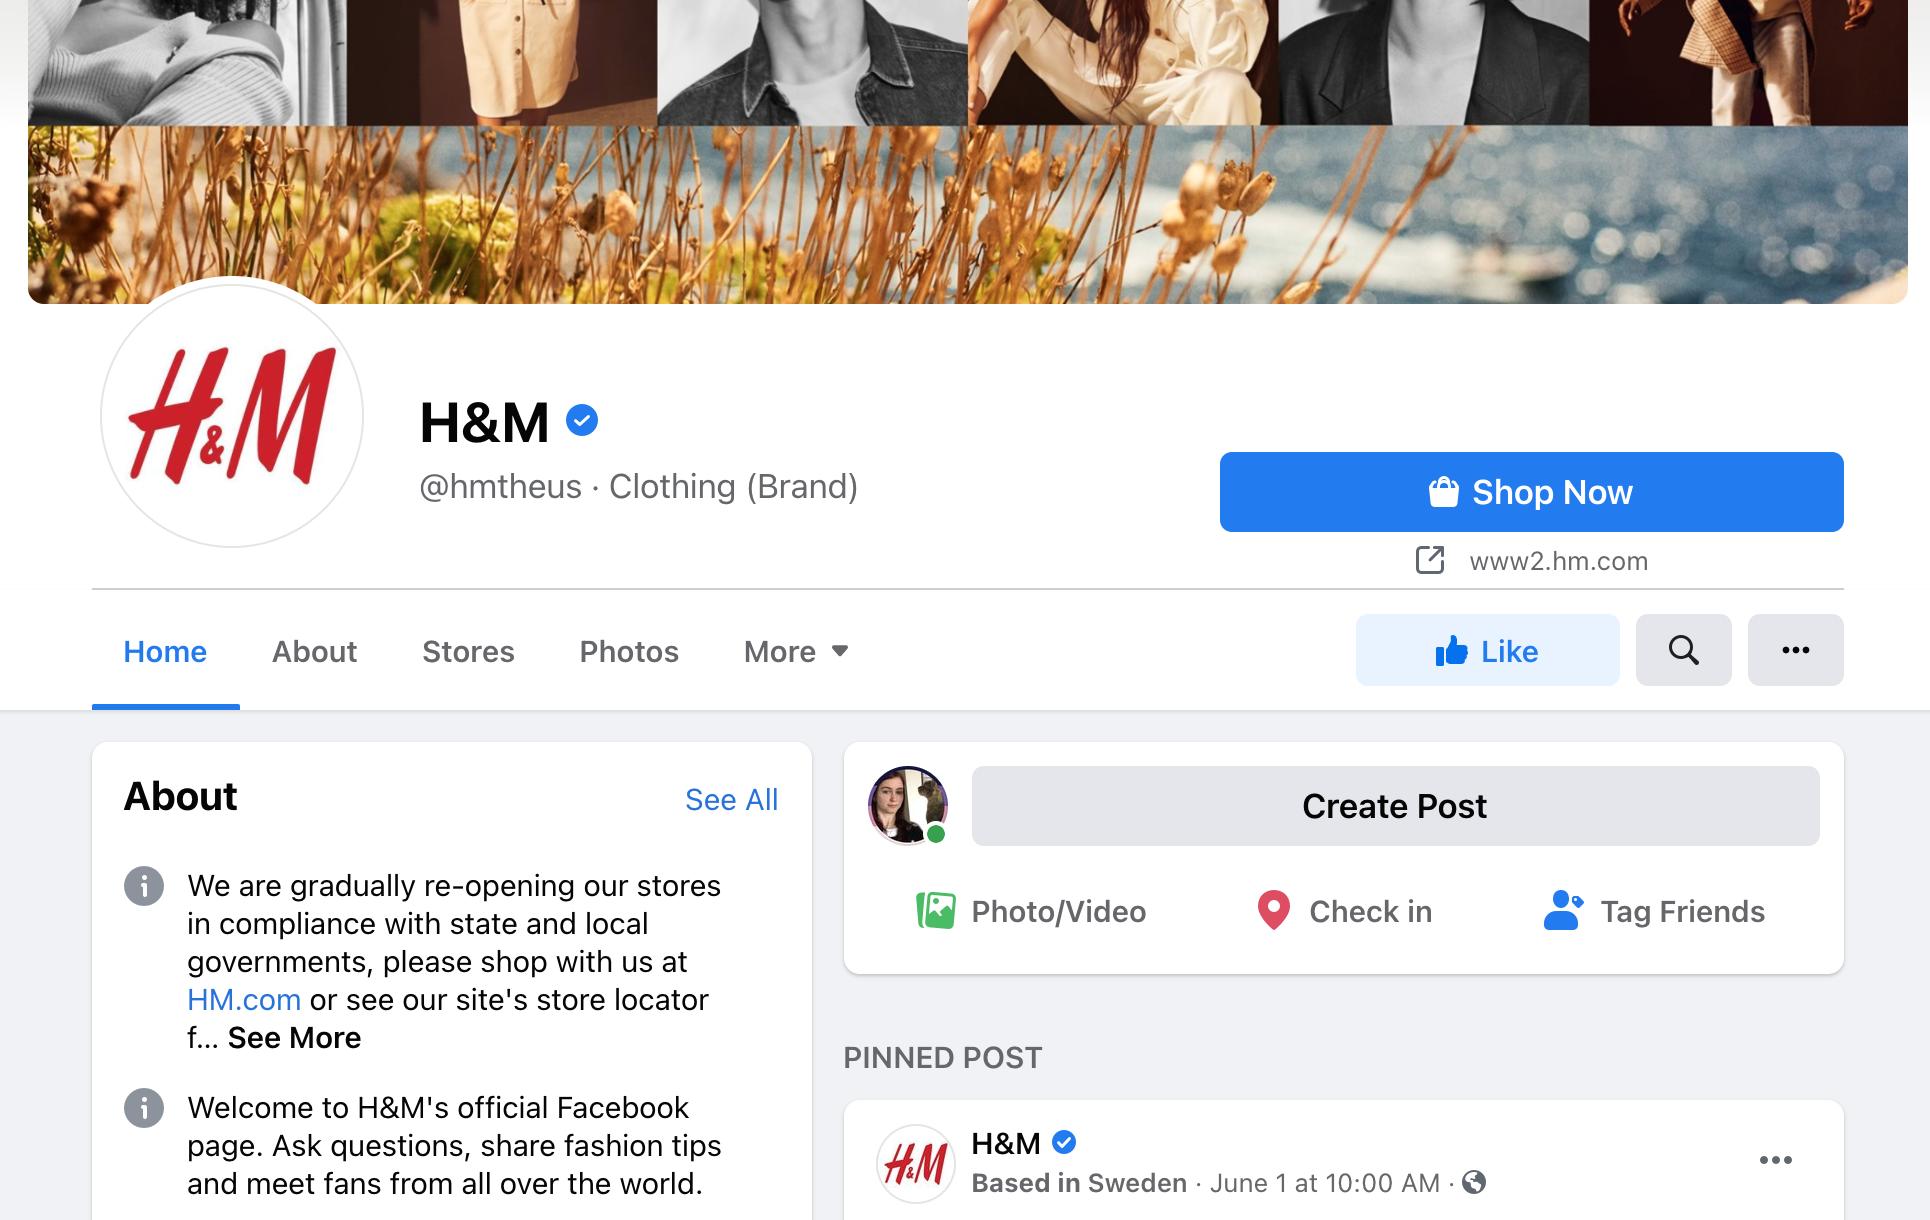 H&M Social Media Page.